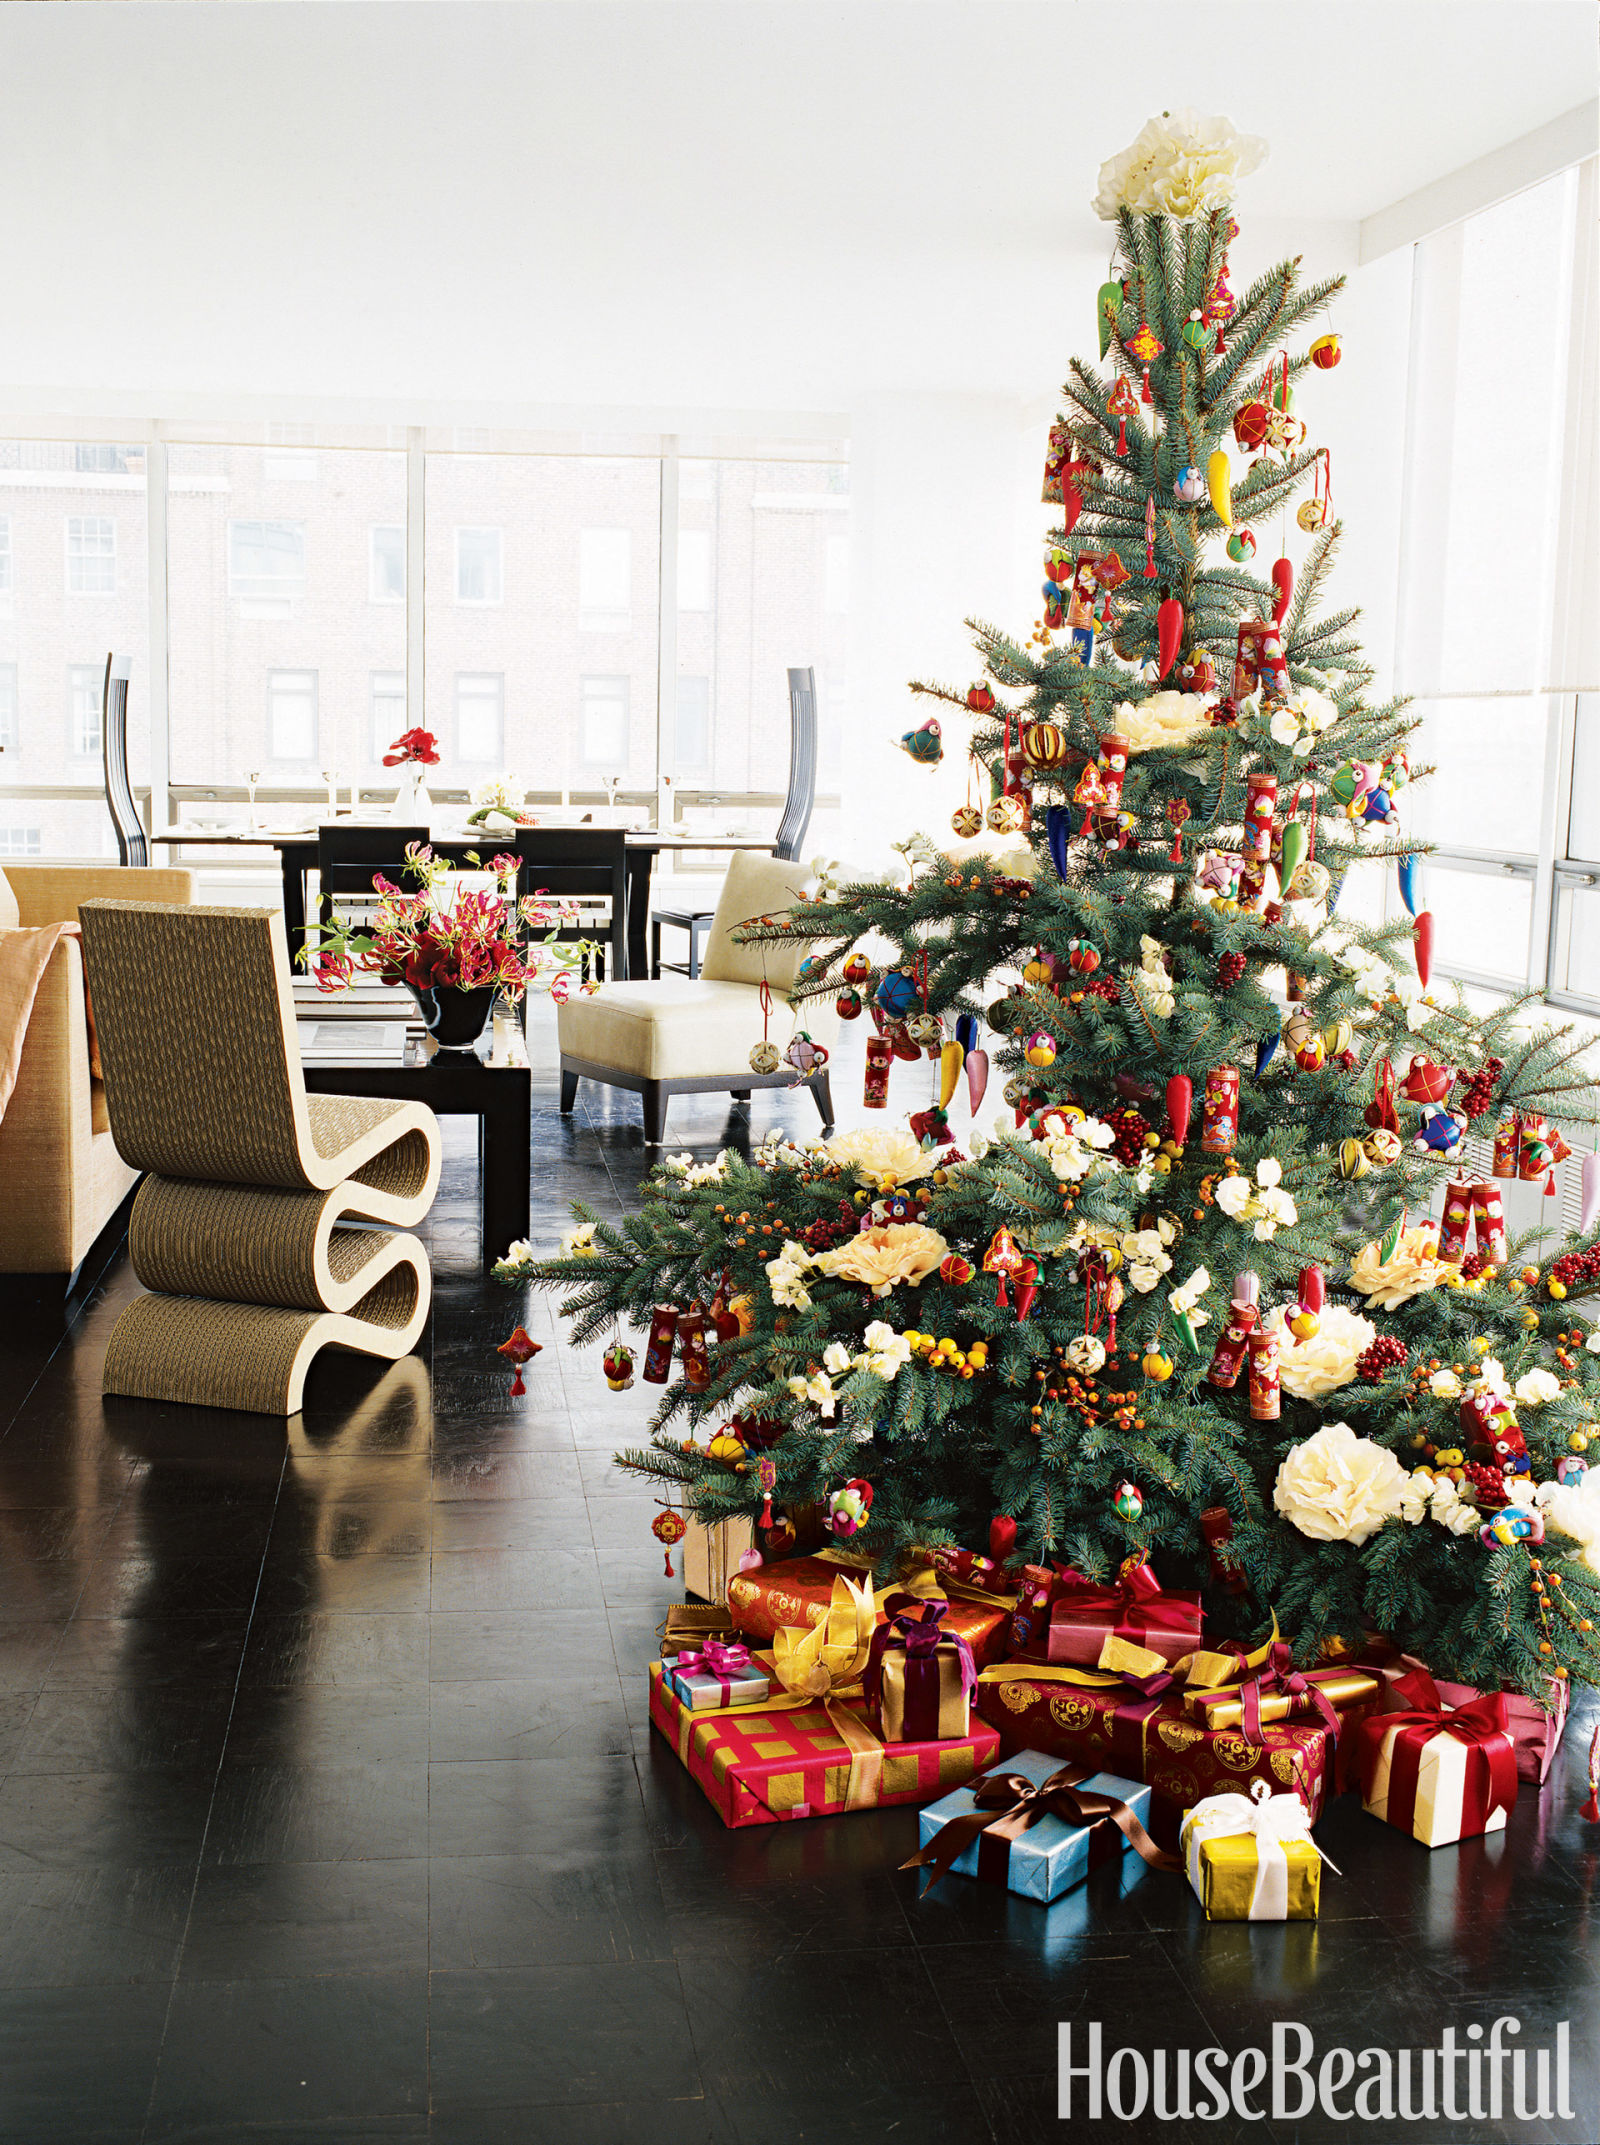 Unique Christmas Decorations Creative Ideas For